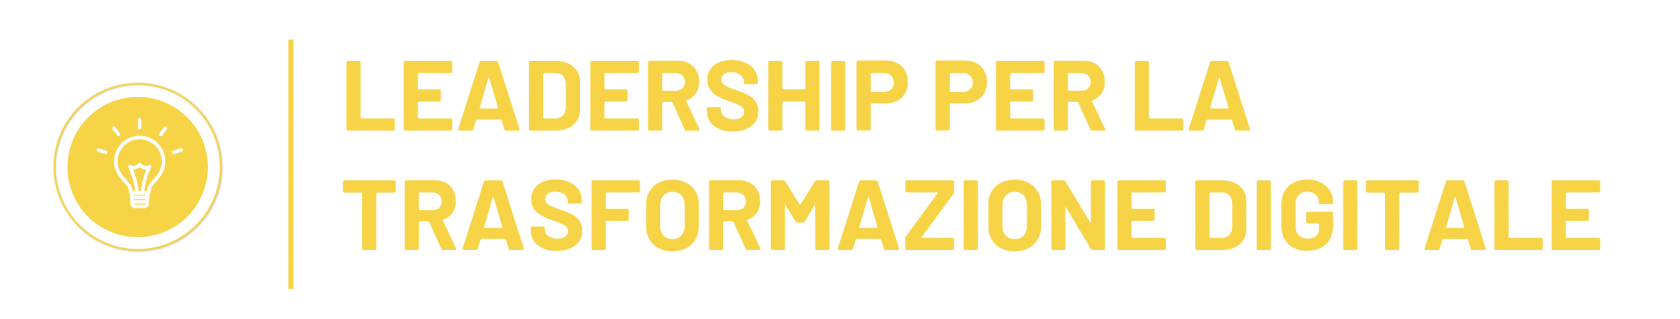 Header LEADERSHIPPERLATRASFORMAZIONEDIGITALEcerchio-01